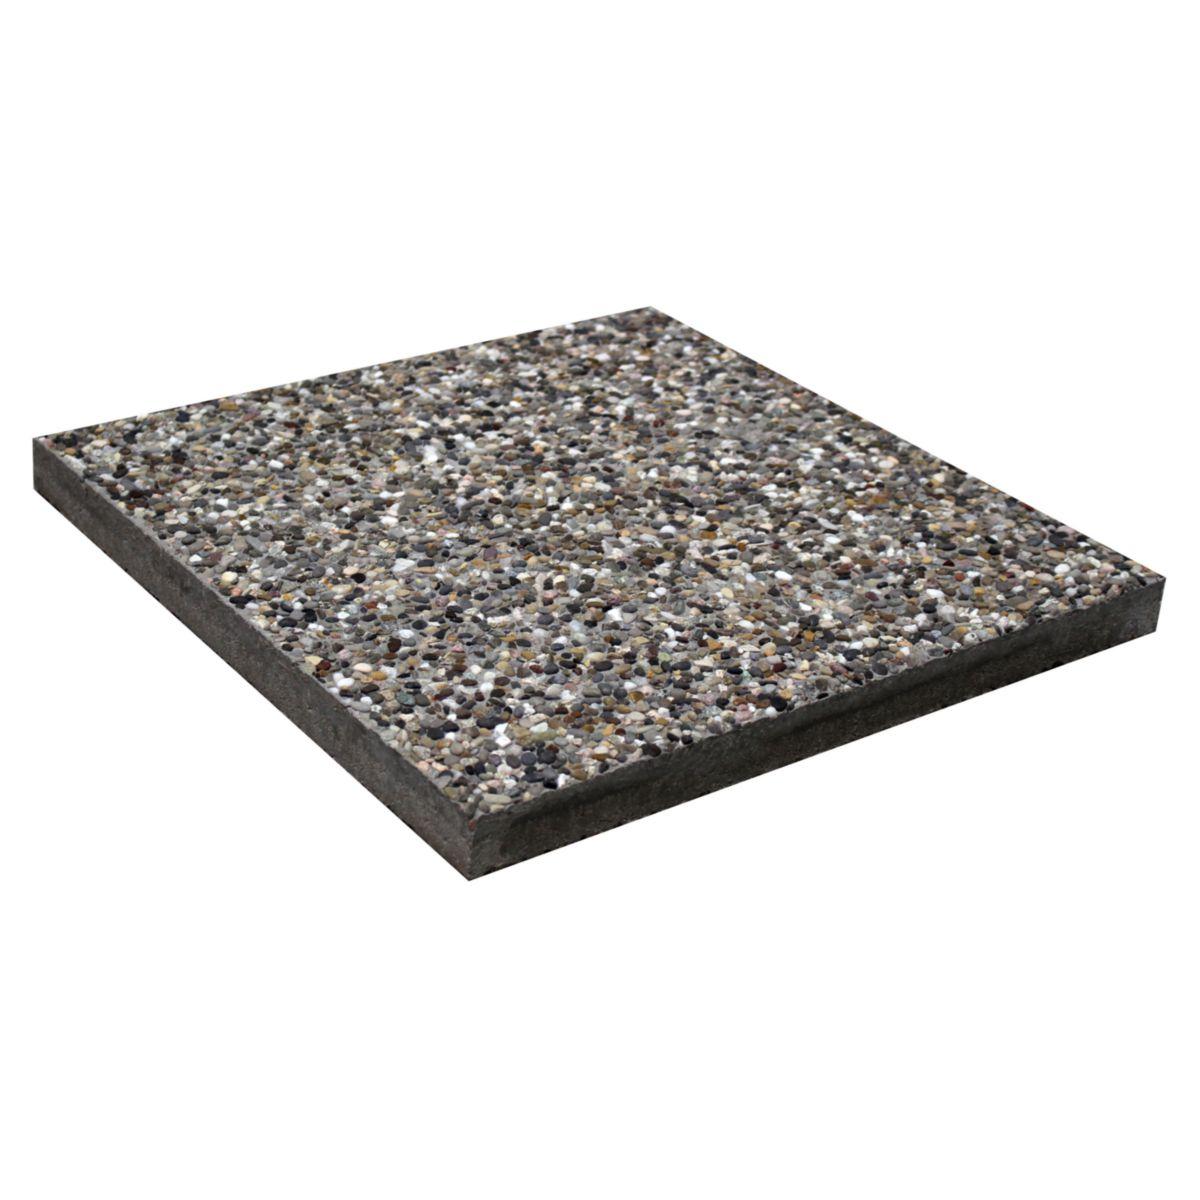 birkenmeier dalle gravillons lav s 4 8 rhin 50x50 cm. Black Bedroom Furniture Sets. Home Design Ideas